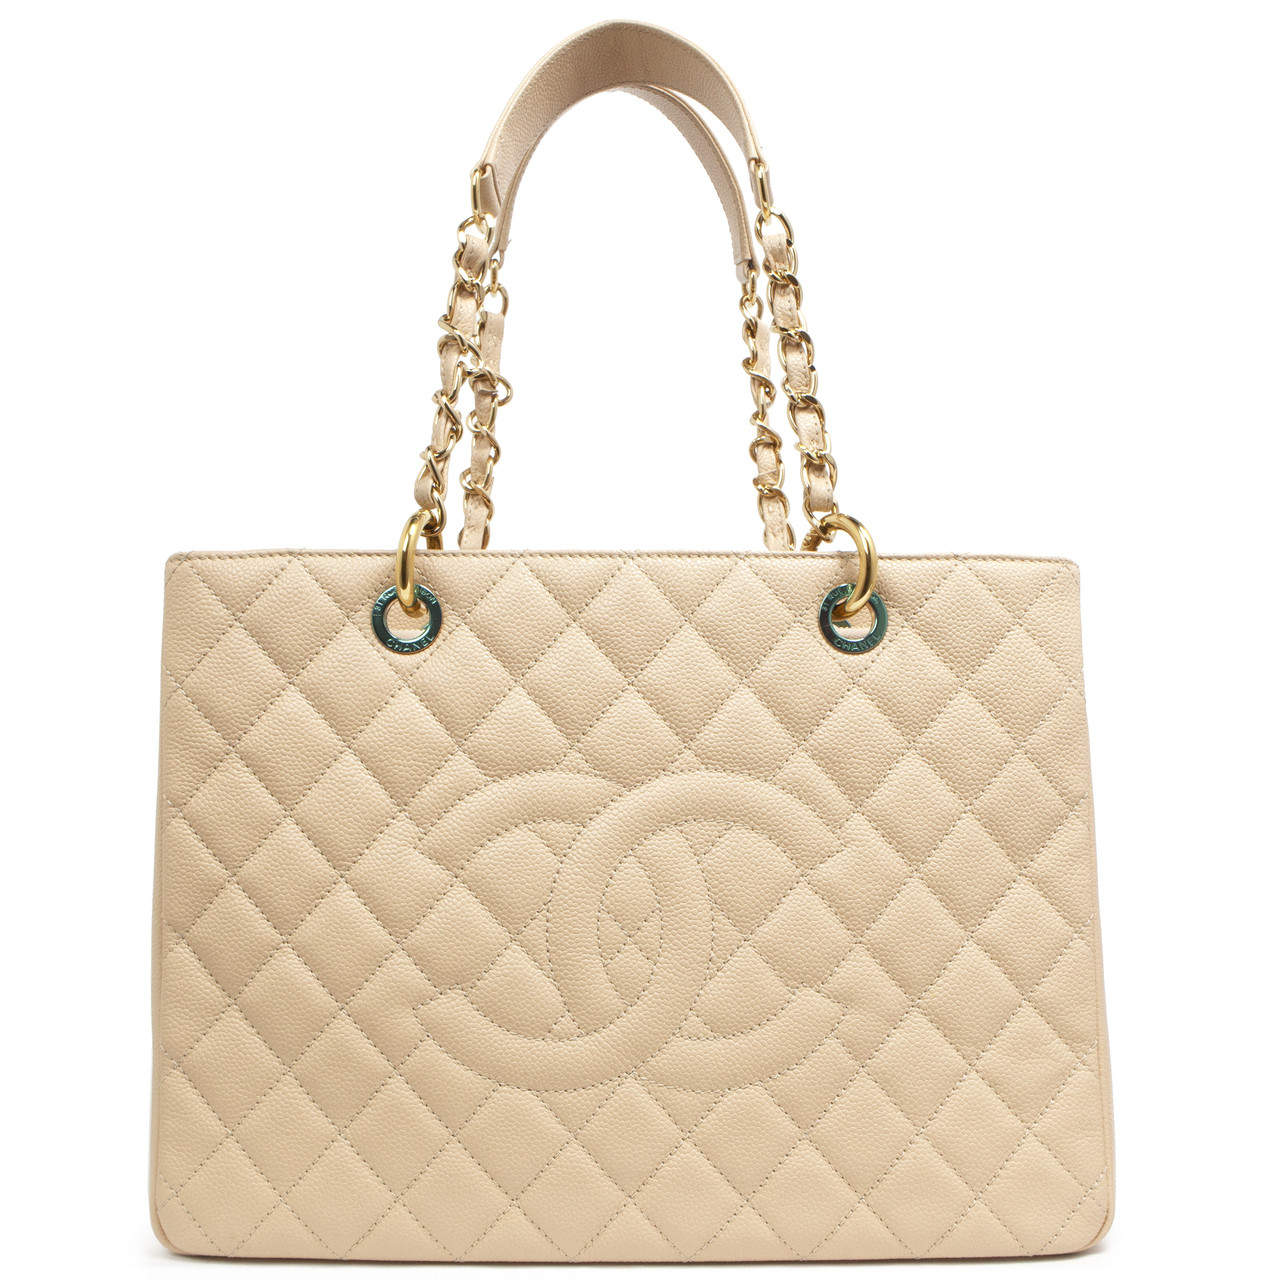 2e81f18f78af Chanel Beige Caviar Grand Shopping Tote GST - modaselle